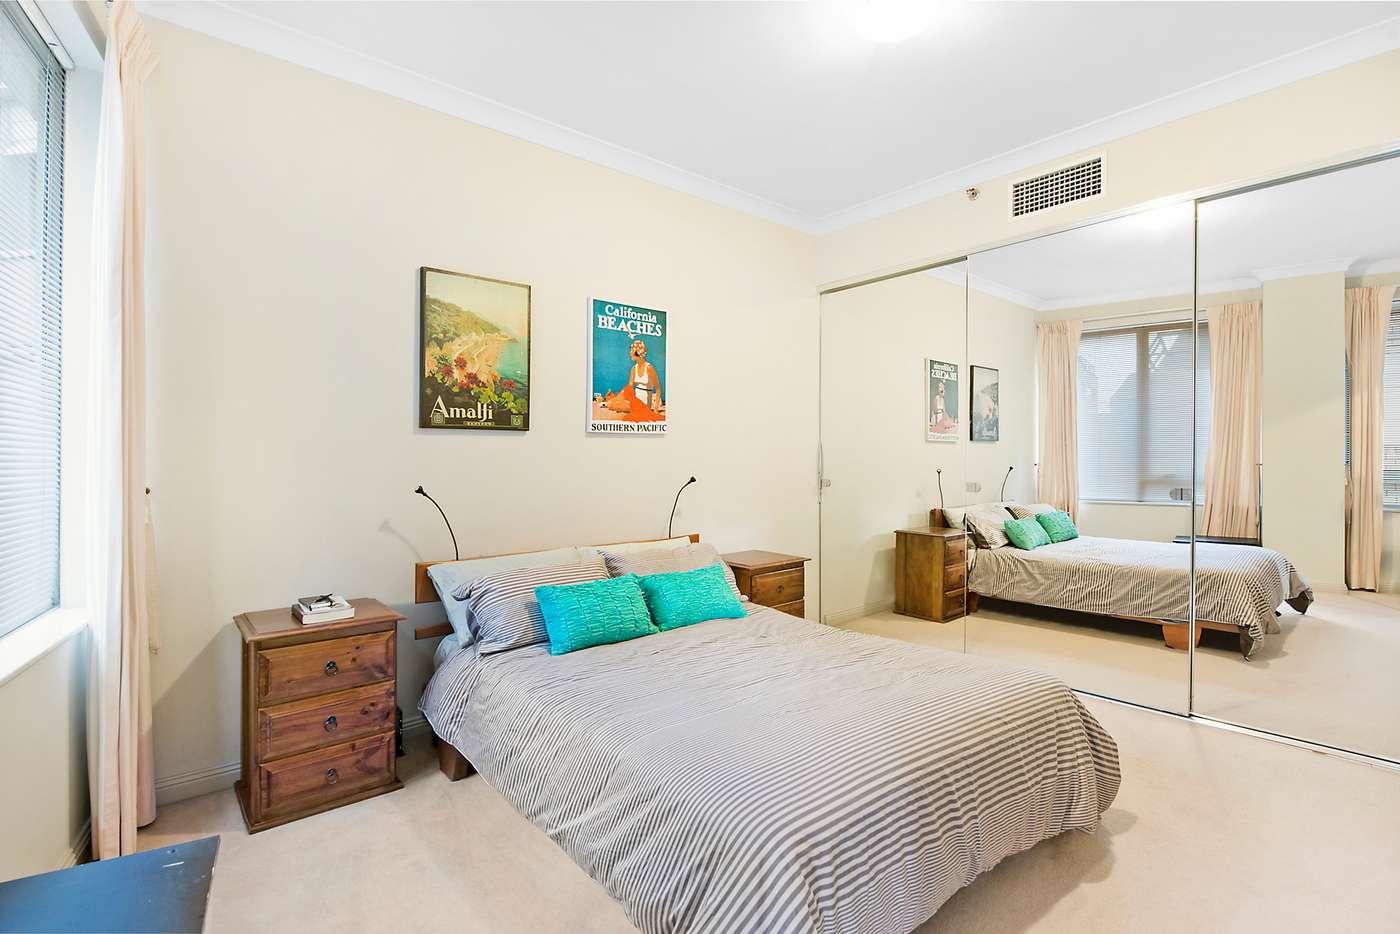 Third view of Homely apartment listing, 1211/38 Bridge Street, Sydney NSW 2000